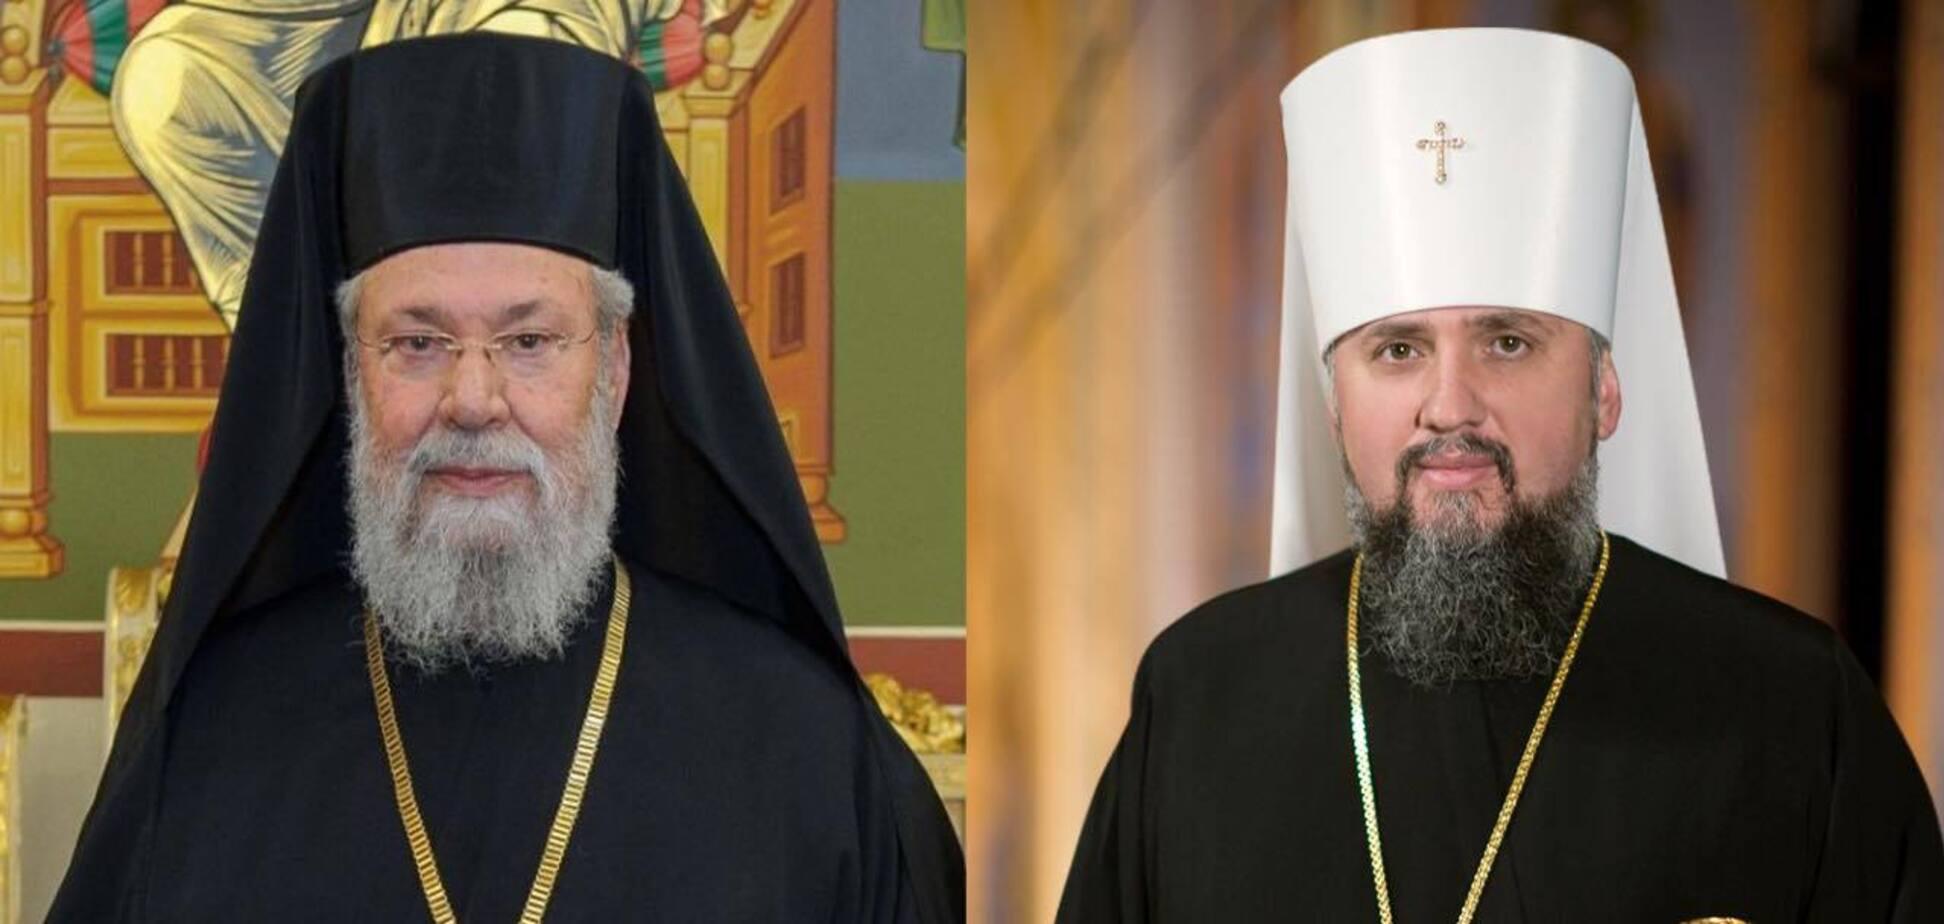 Архиепископ Хризостом ІІ пригласил Митрополита Епифания на Кипр